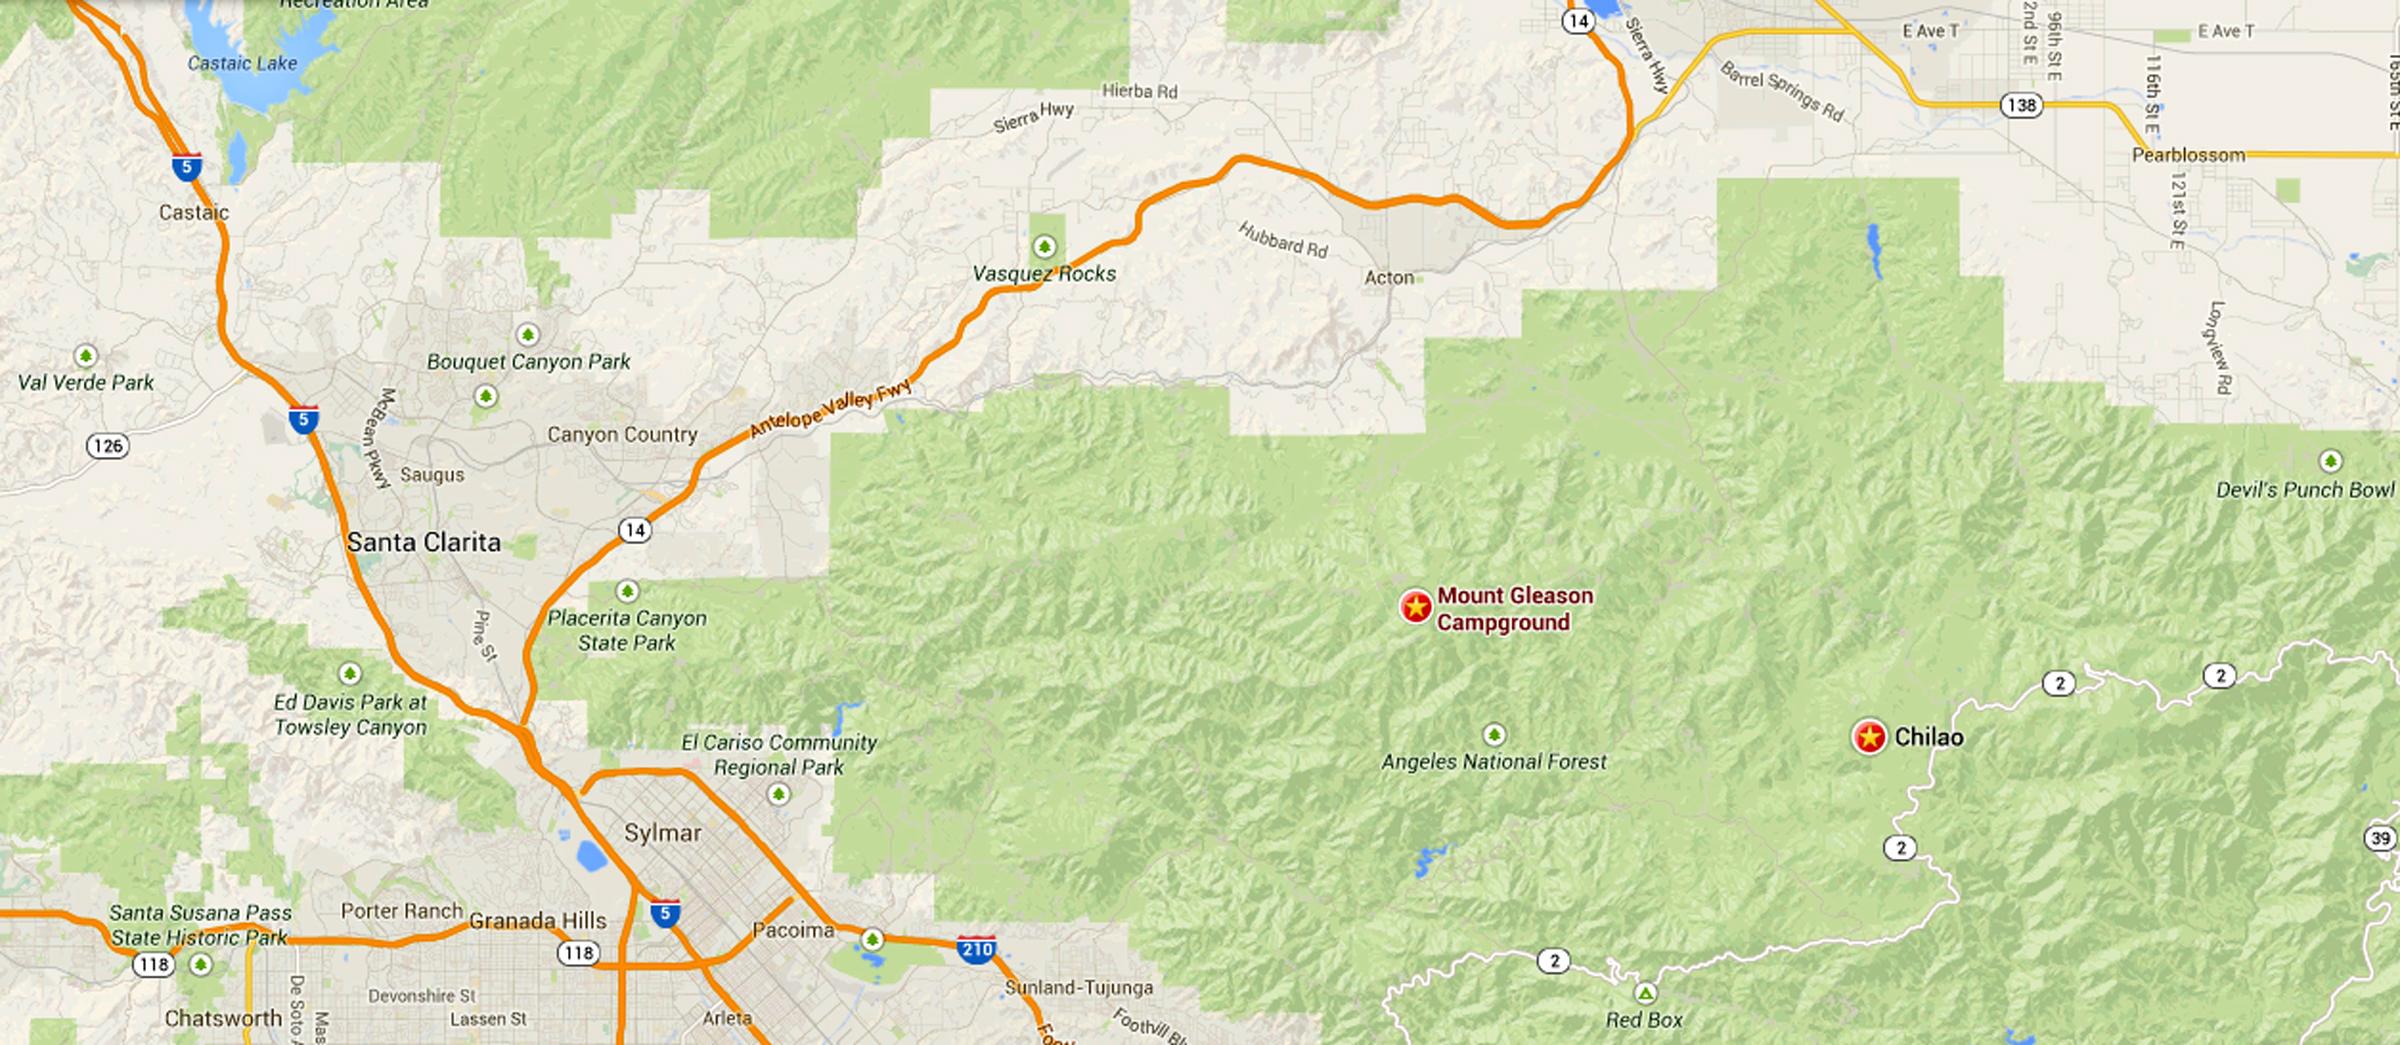 SCVHistorycom San Gabriels Bears I Have Met The Stories Of - Us map san gabriels mountain range